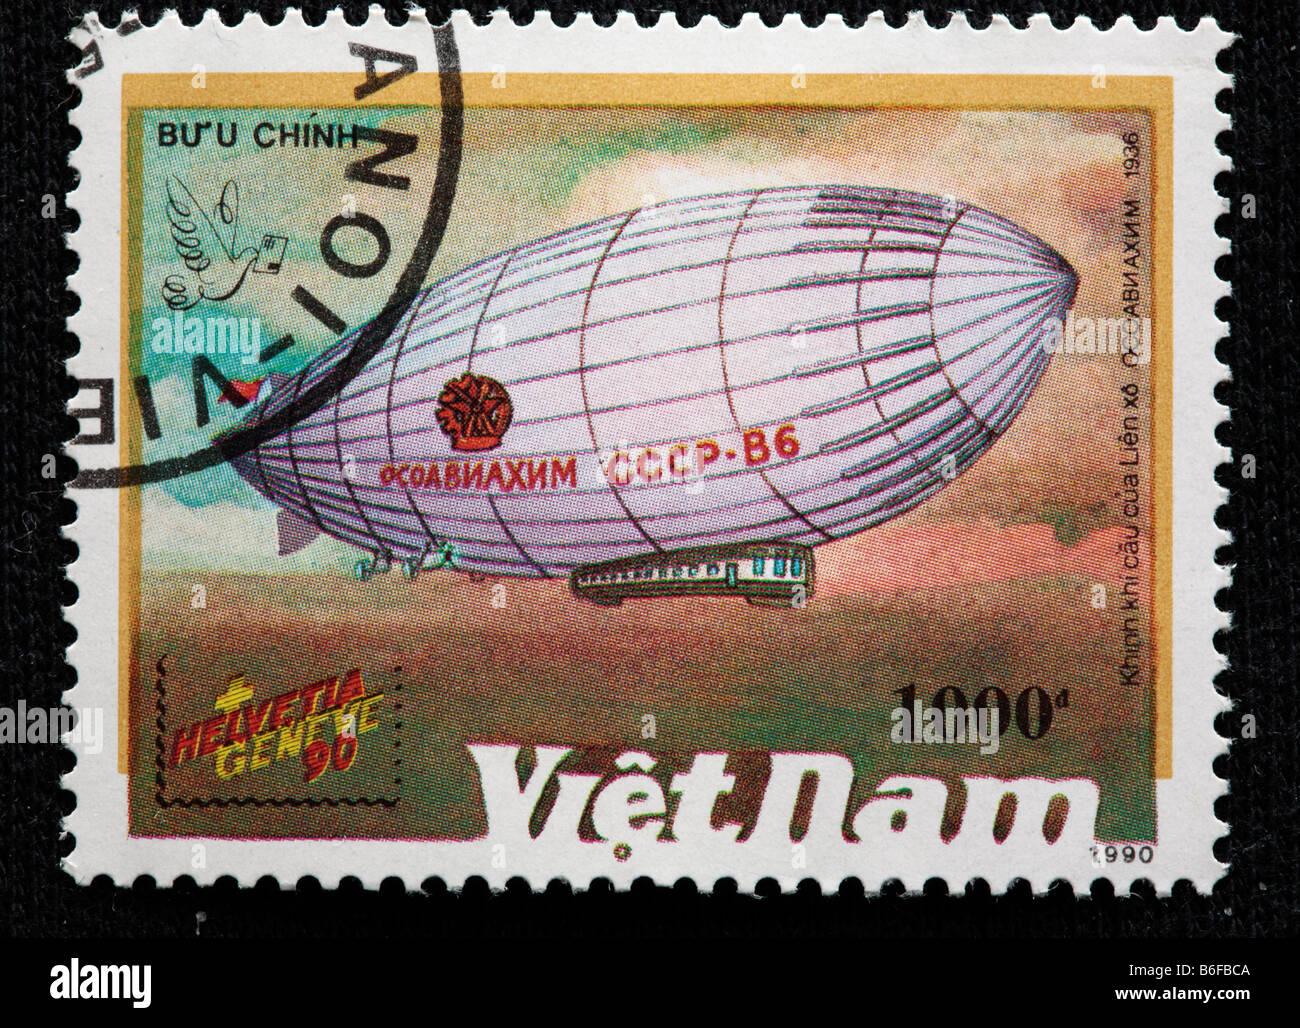 "History of aviation, Russian airship ""Osoaviakhim"" (1936), postage stamp, Vietnam, 1990 Stock Photo"